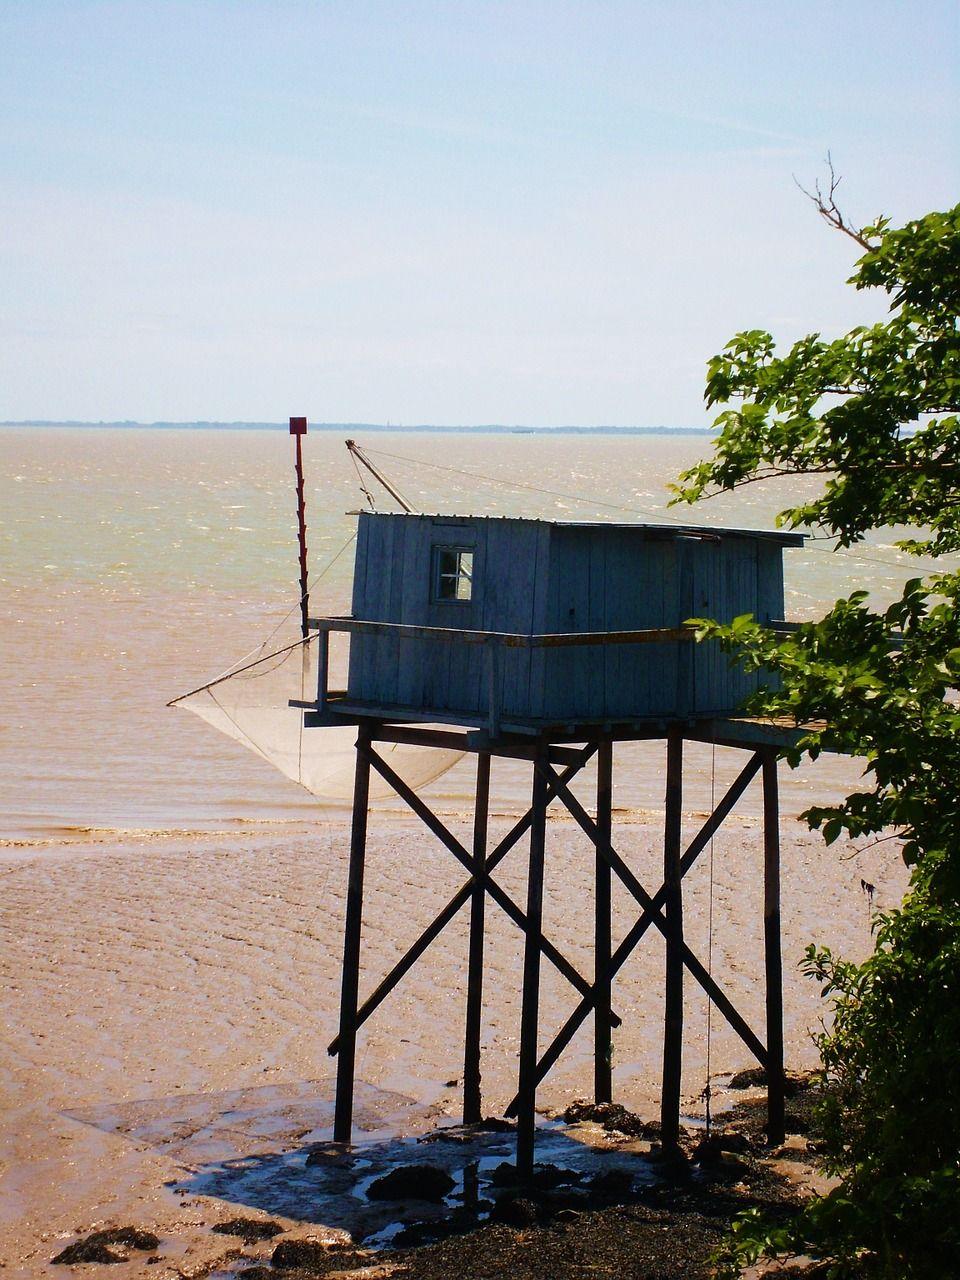 France Cabin On Stilts Fisherman S Hut Net France Cabinonstilts Fisherman Shut Net Hut Old Fisherman Vacation